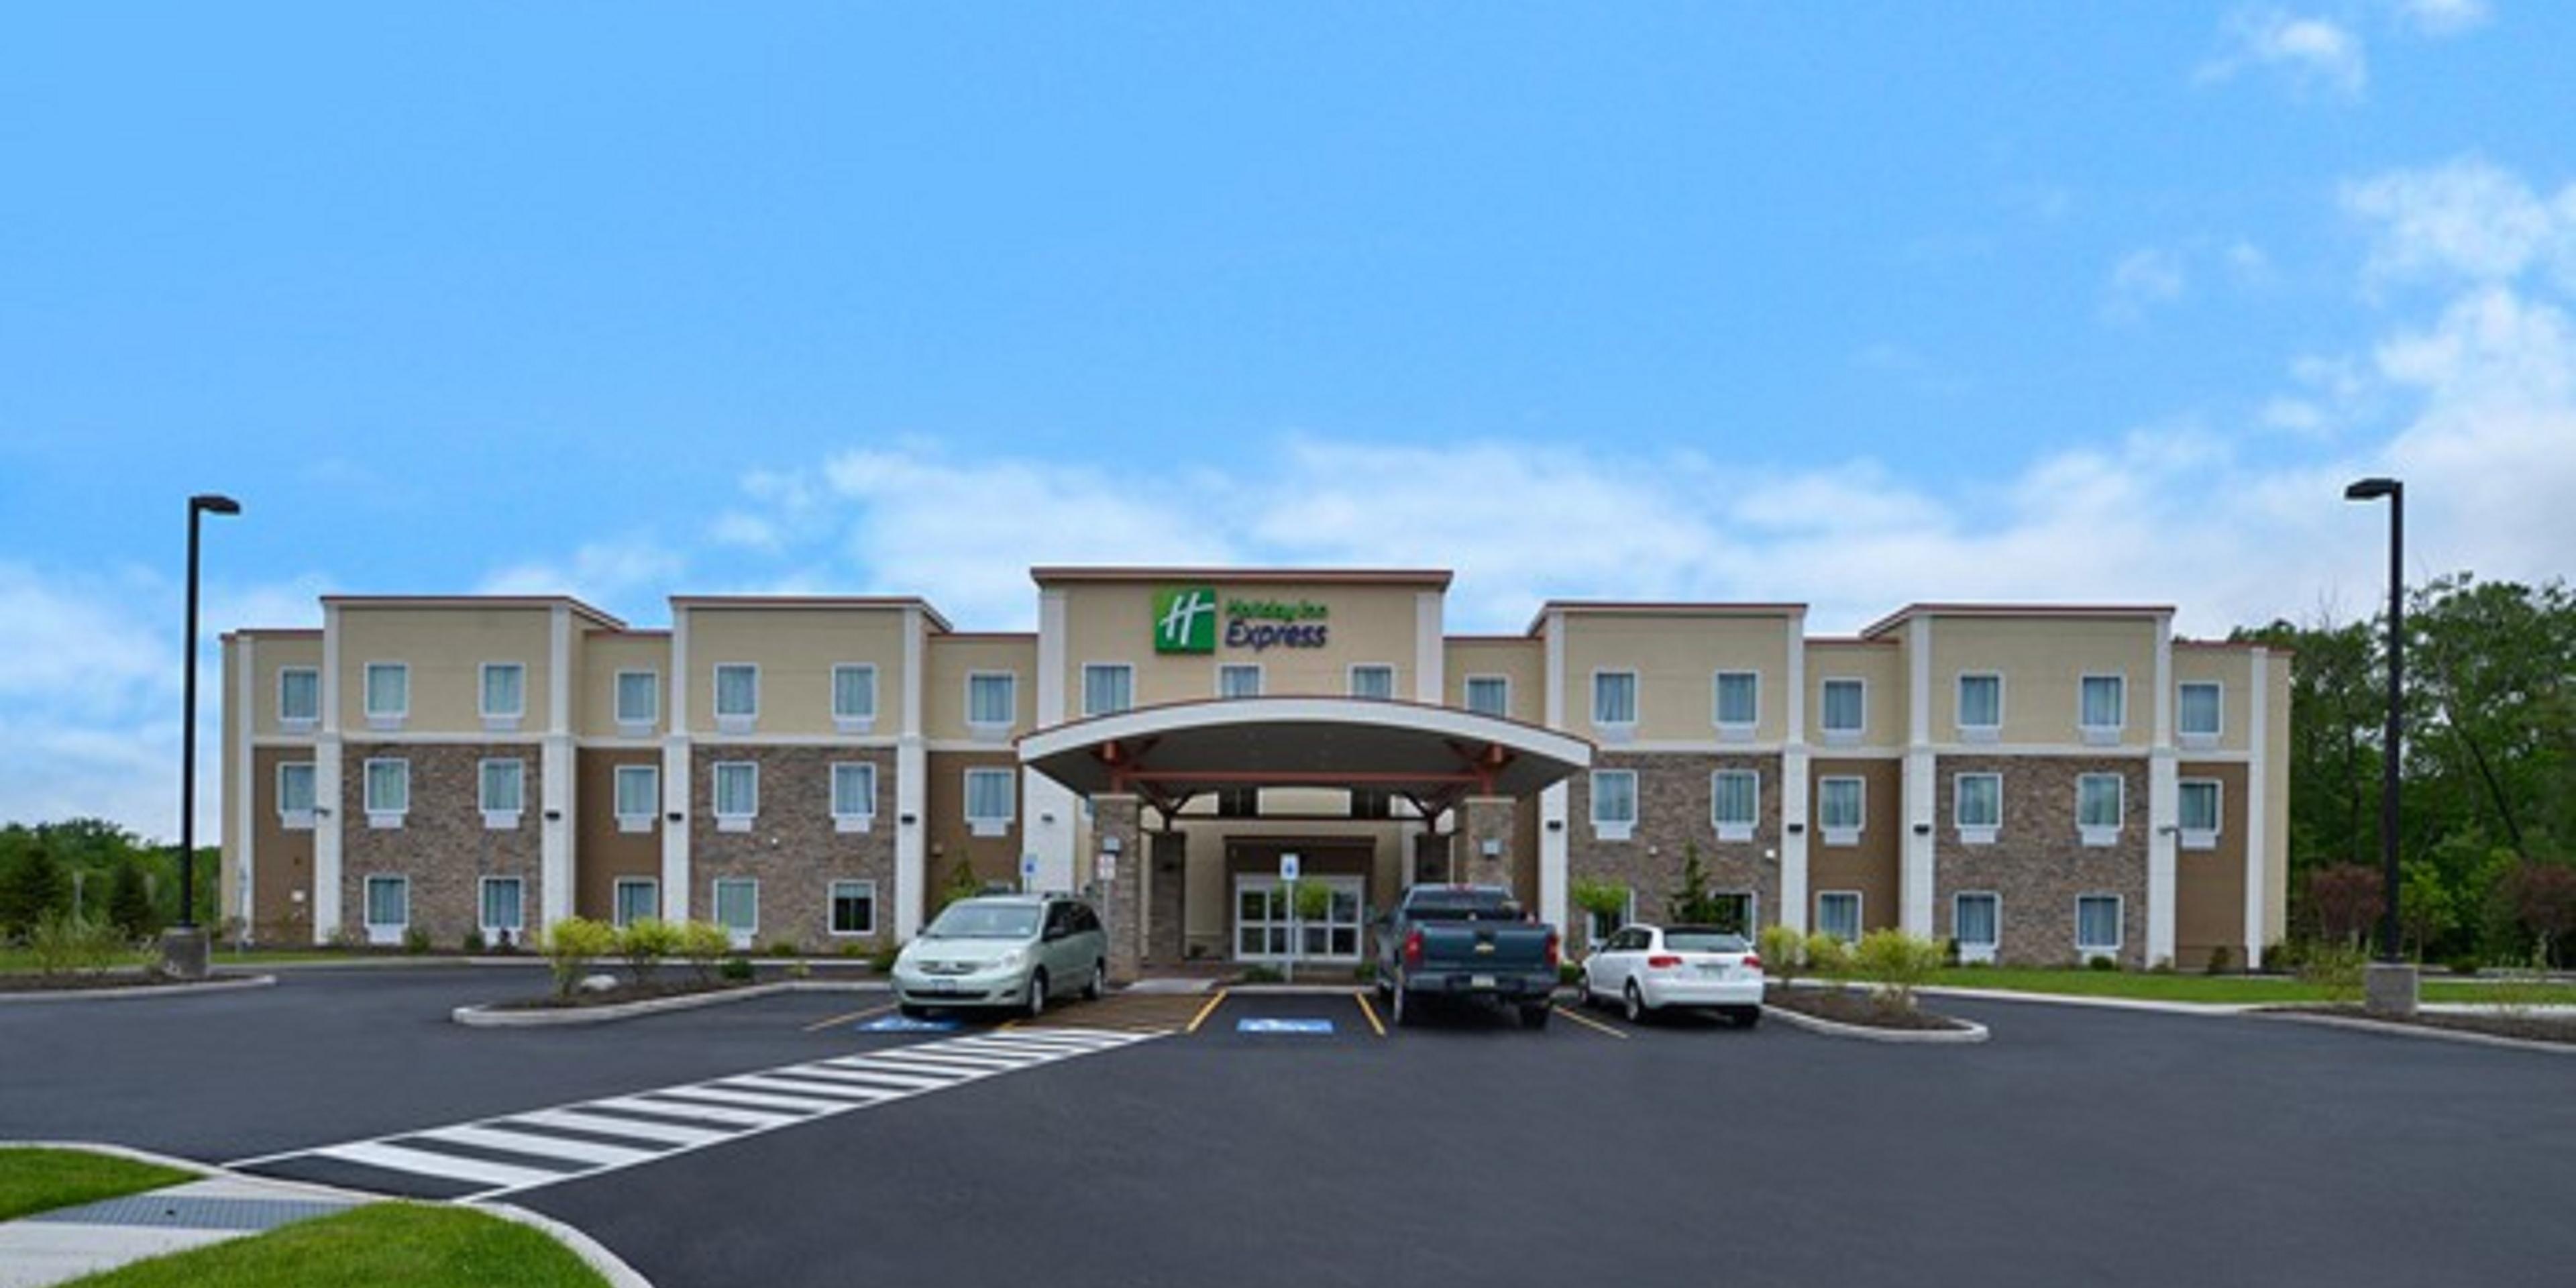 Holiday Inn Express Canandaigua 3795212292 2x1